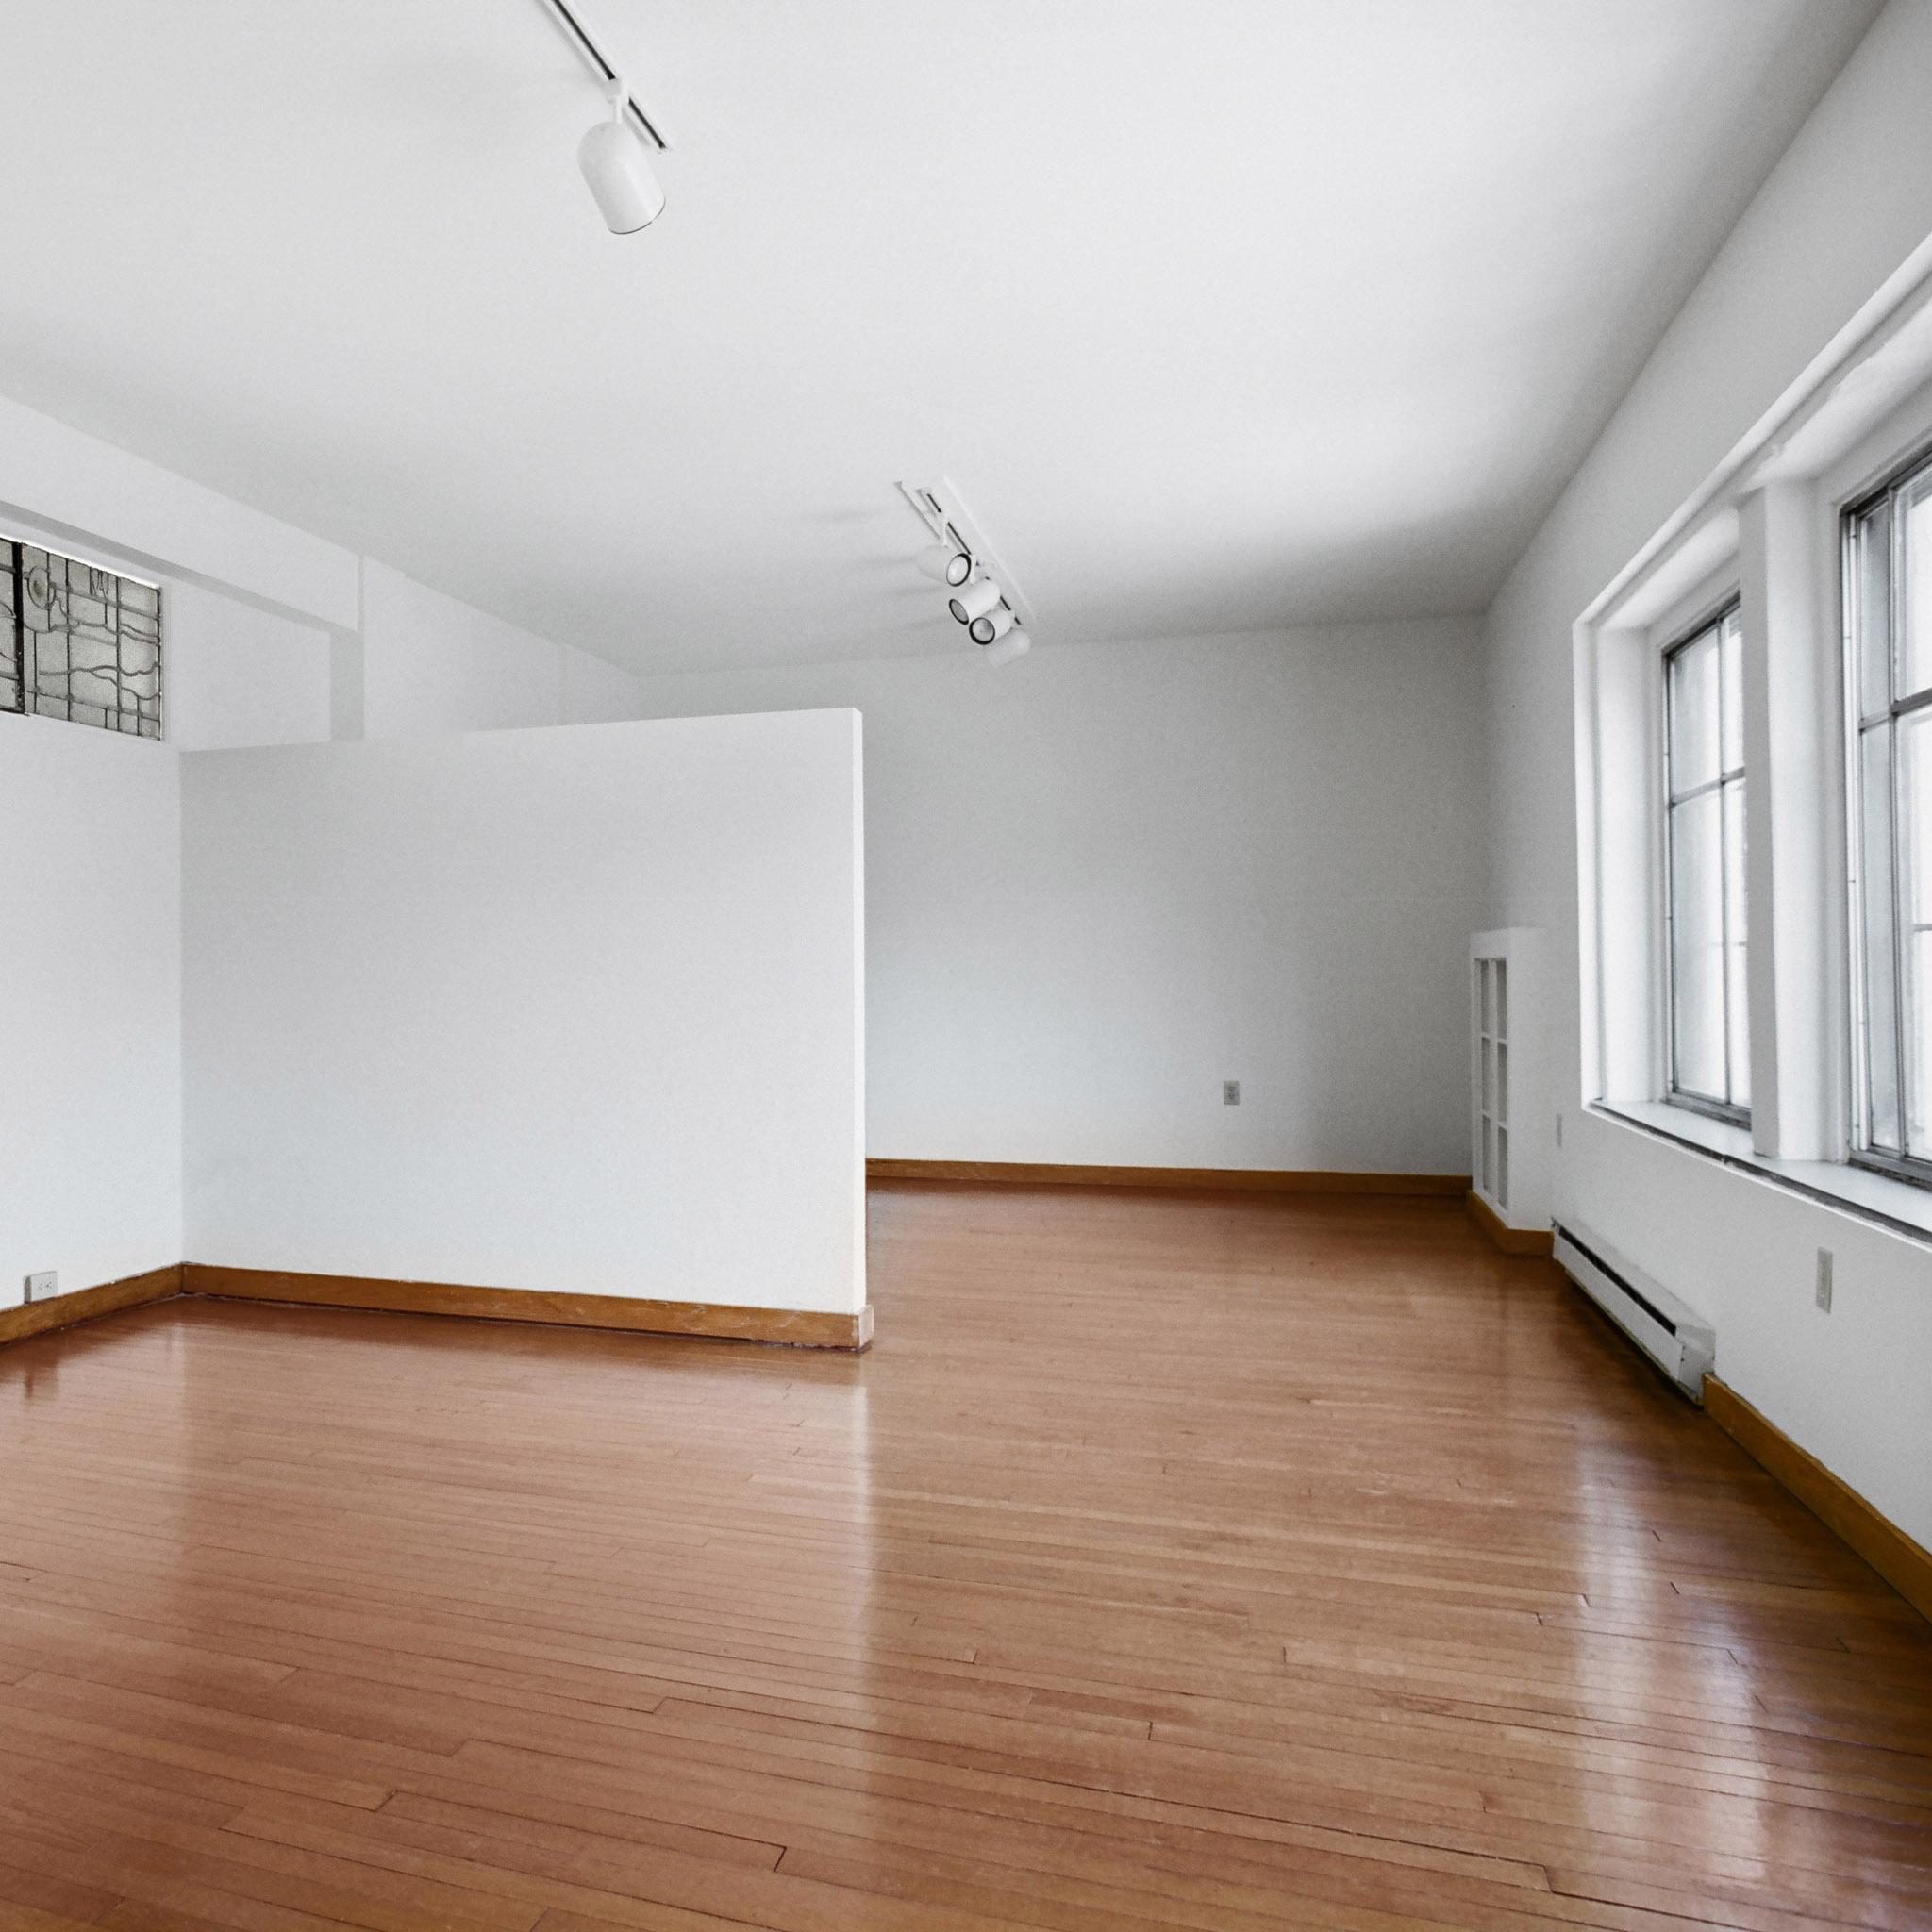 interior of 340 S. Highland Ave, Apt. 5A 4